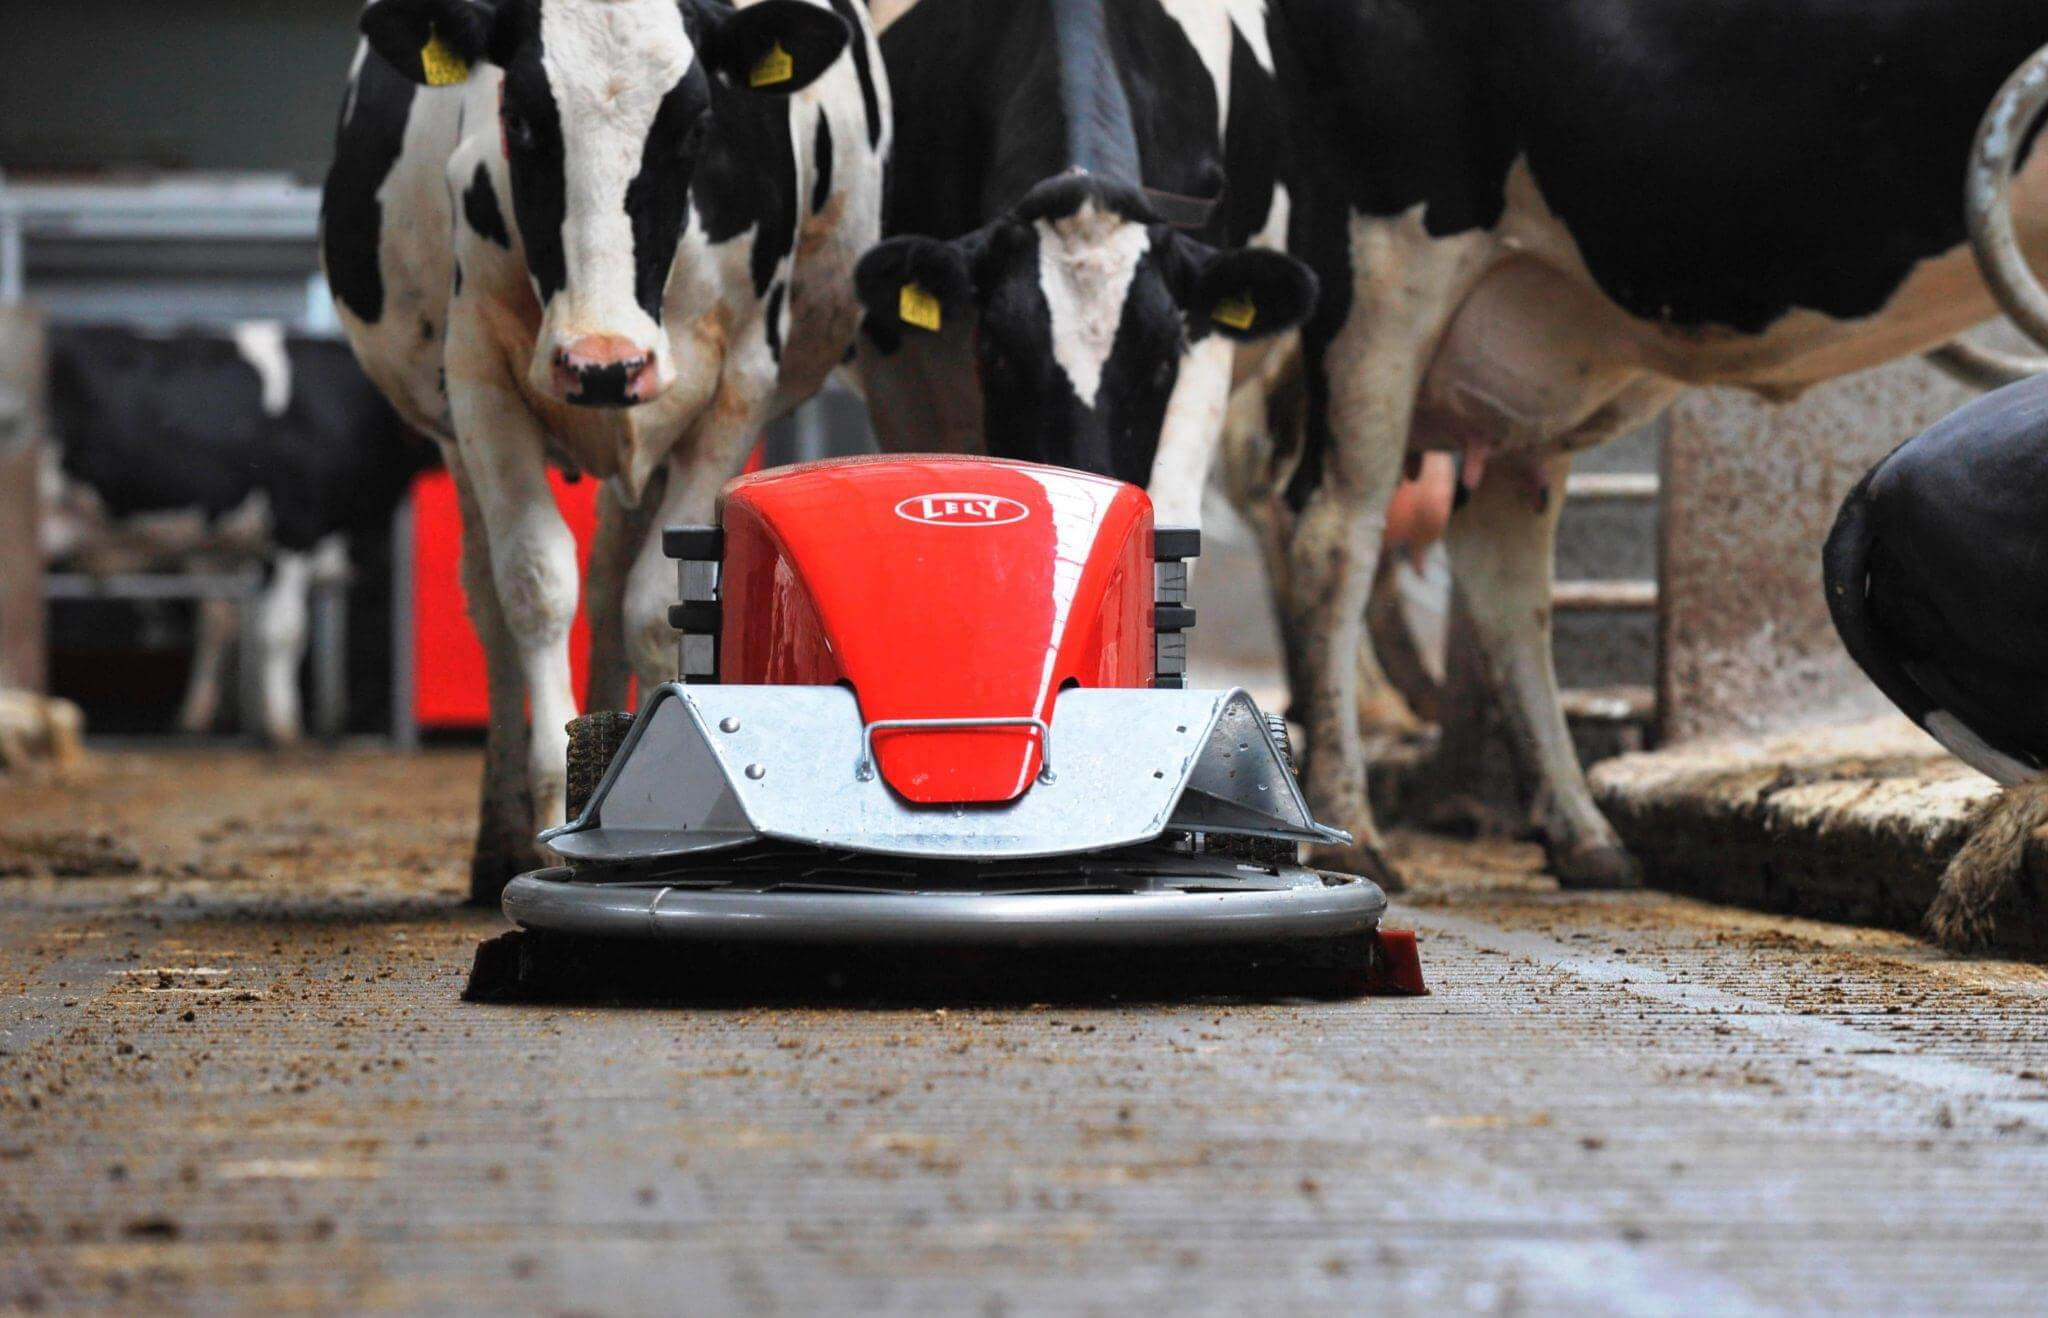 Lely Discovery este un robot de curatat dedicat fermelor